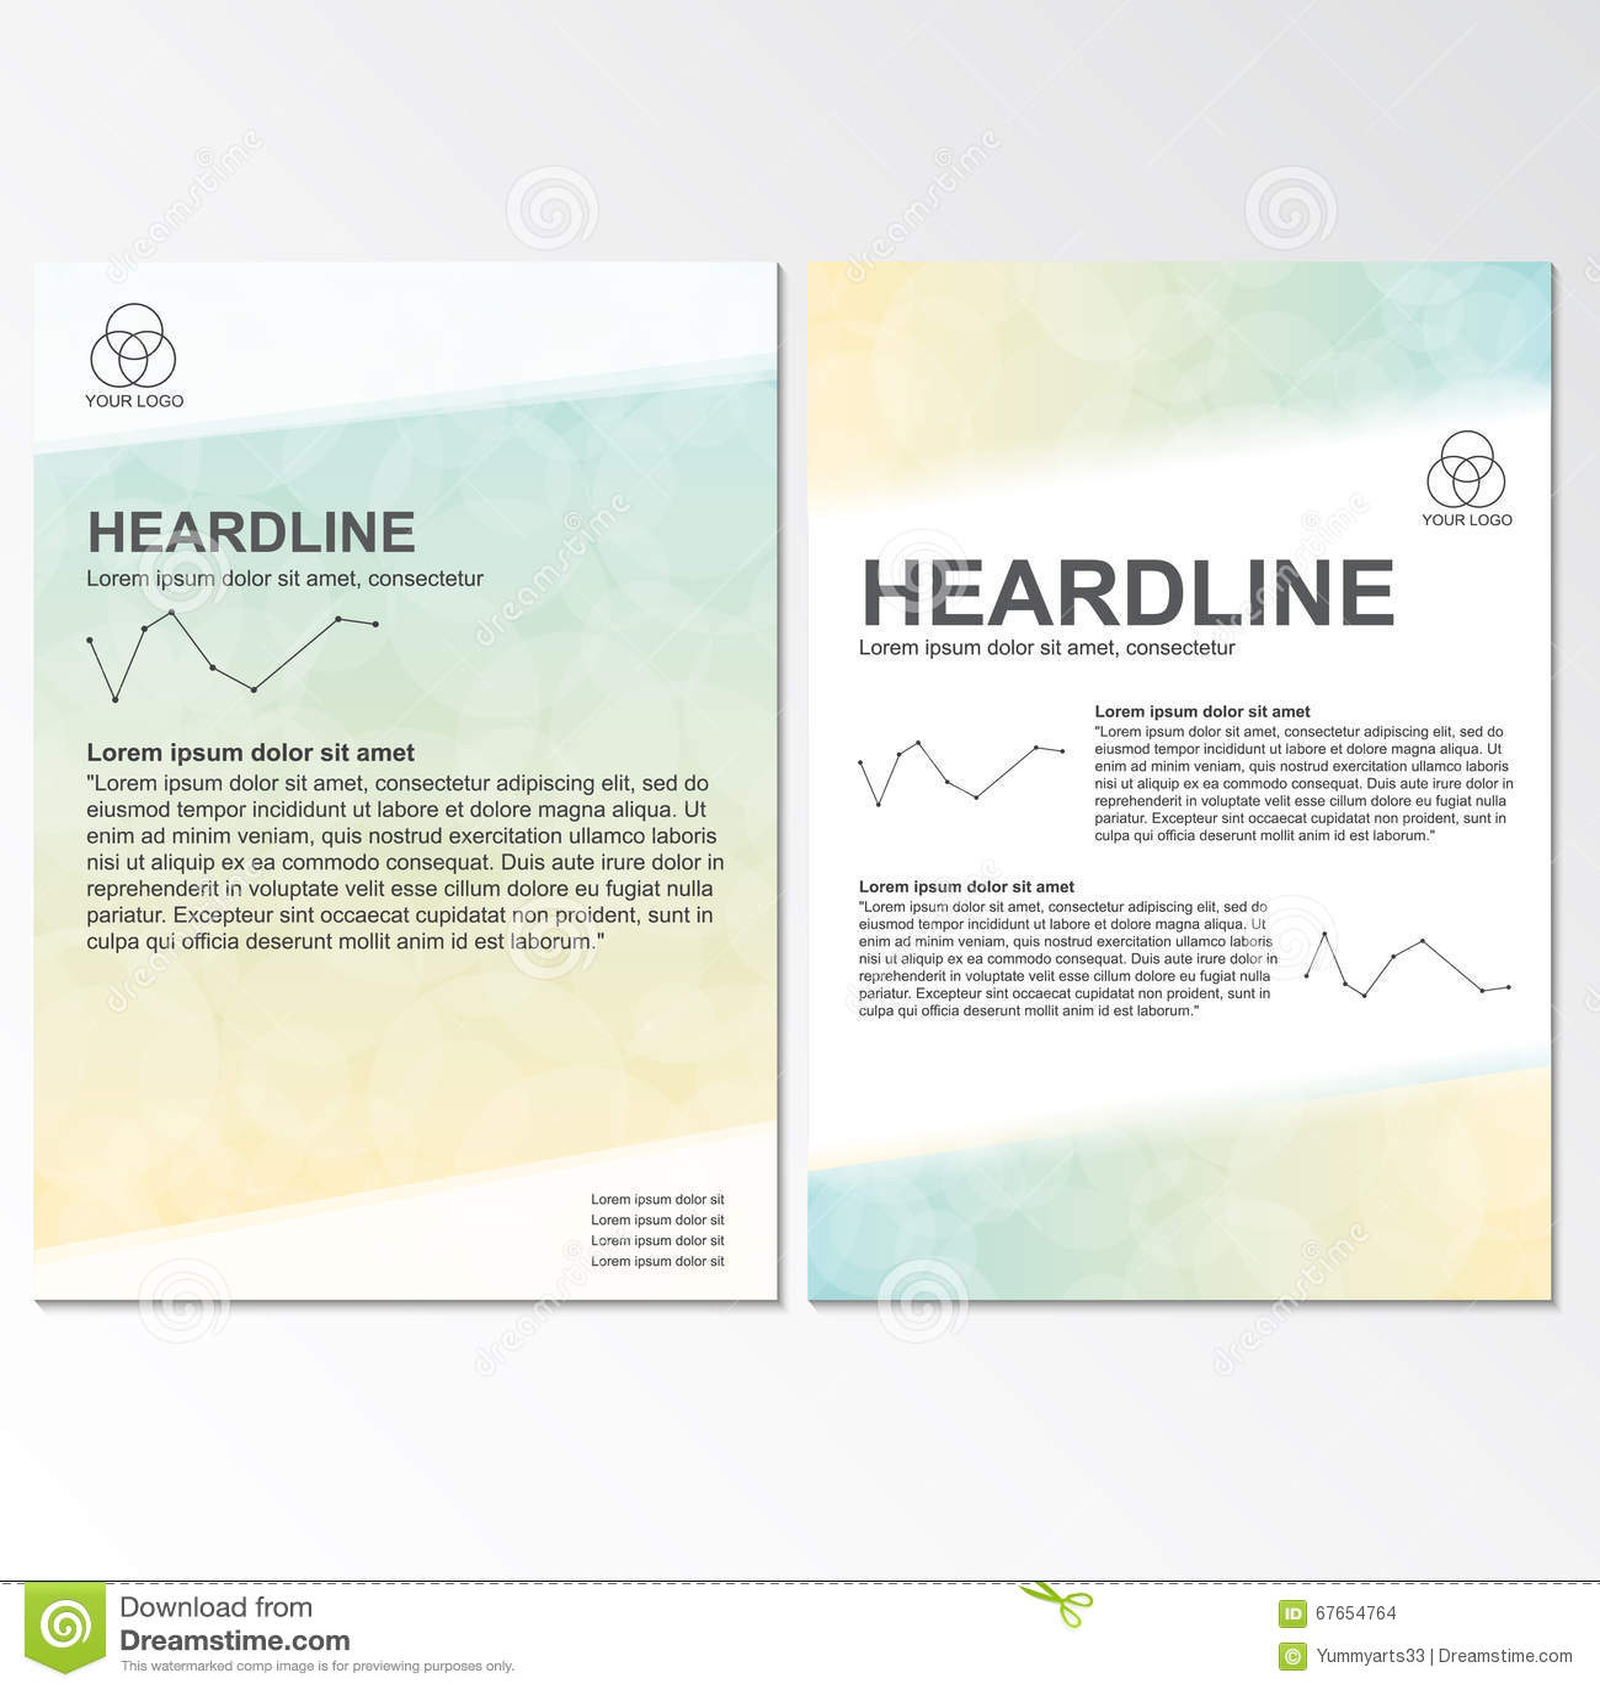 Vector brochure template design with circel elements.